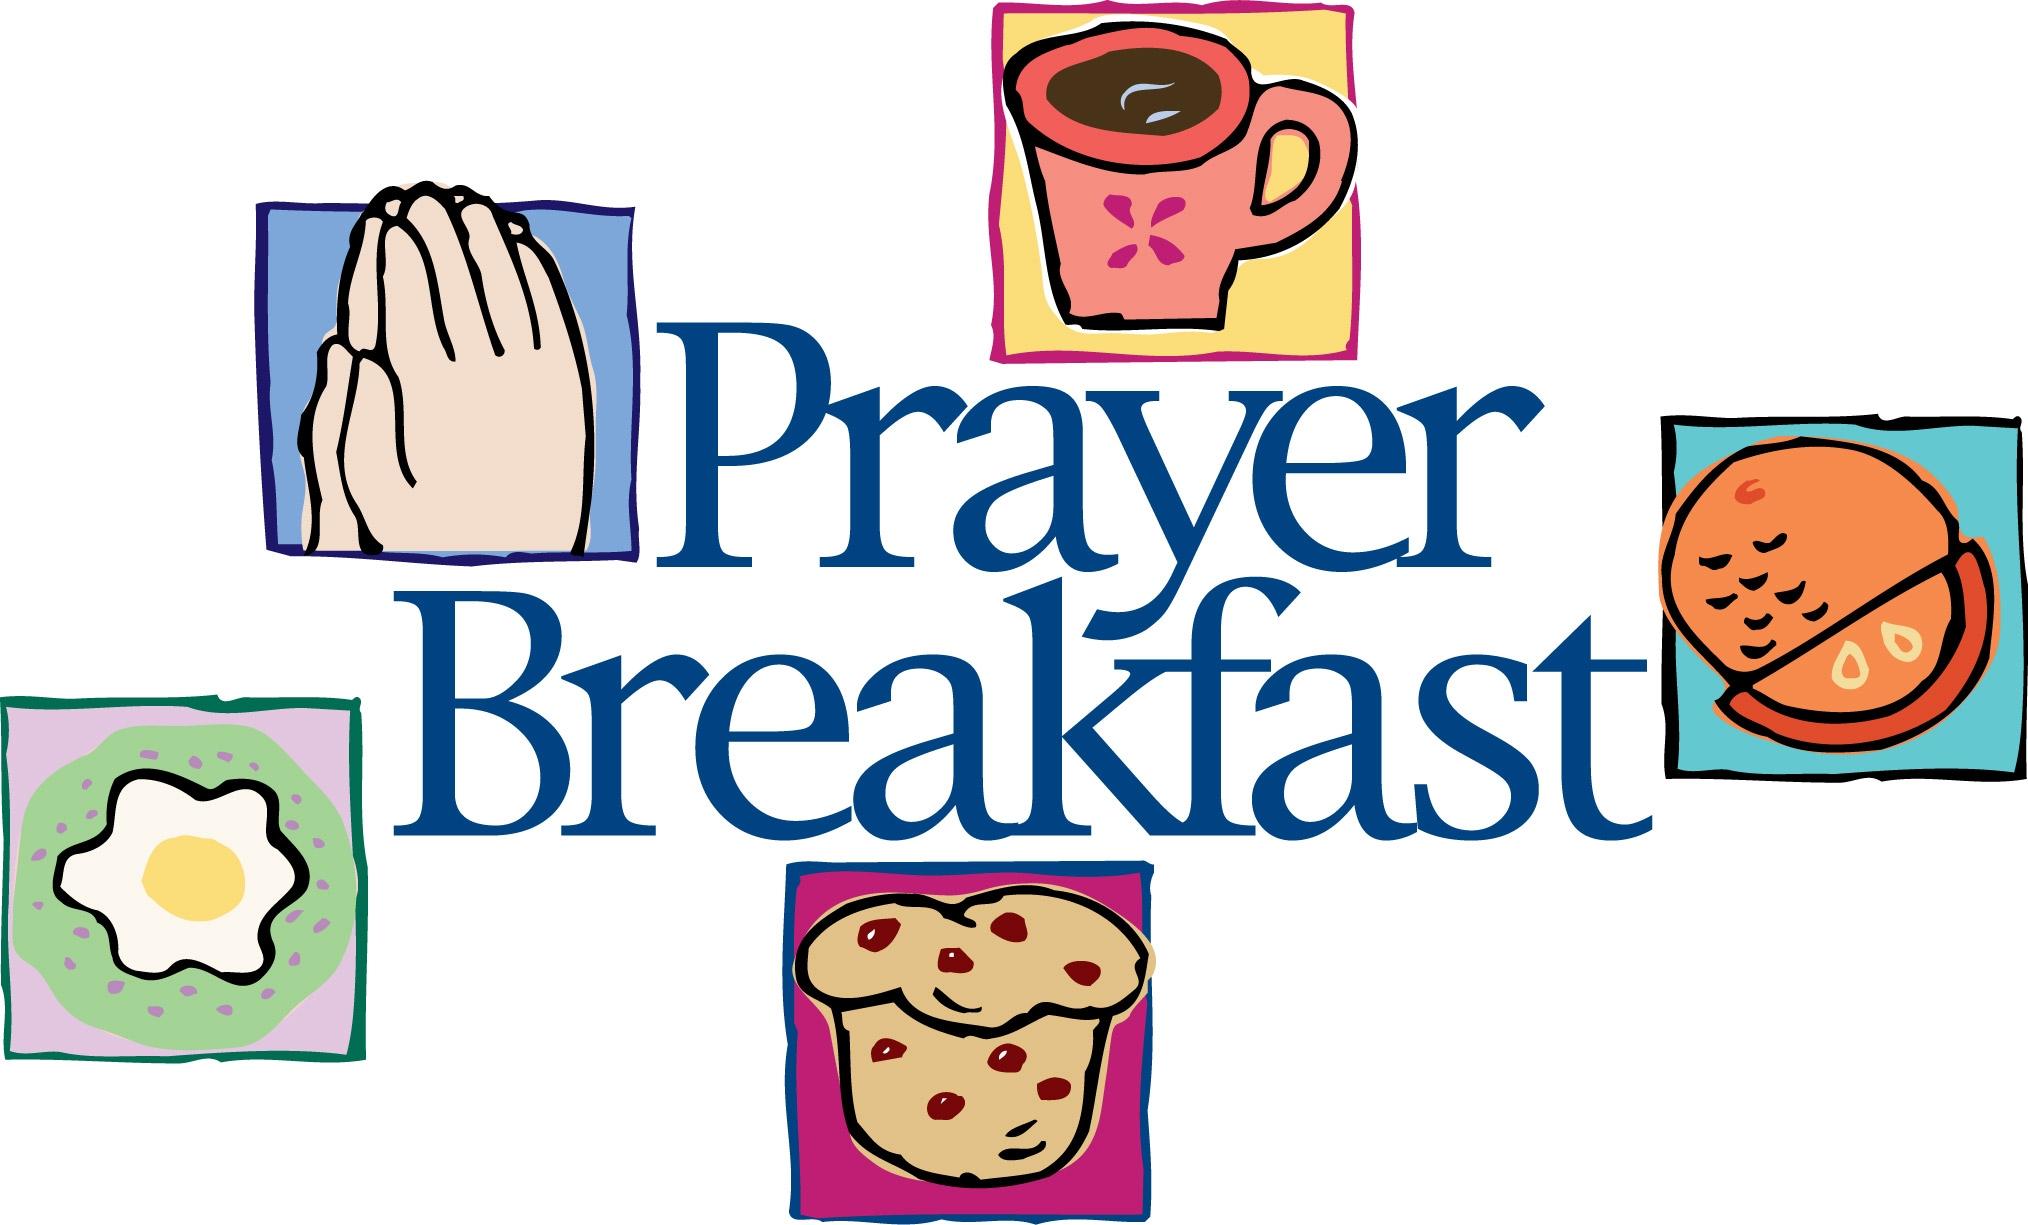 Prayer breakfast clipart clipart freeuse Prayer Breakfast Clipart | Free download best Prayer ... clipart freeuse